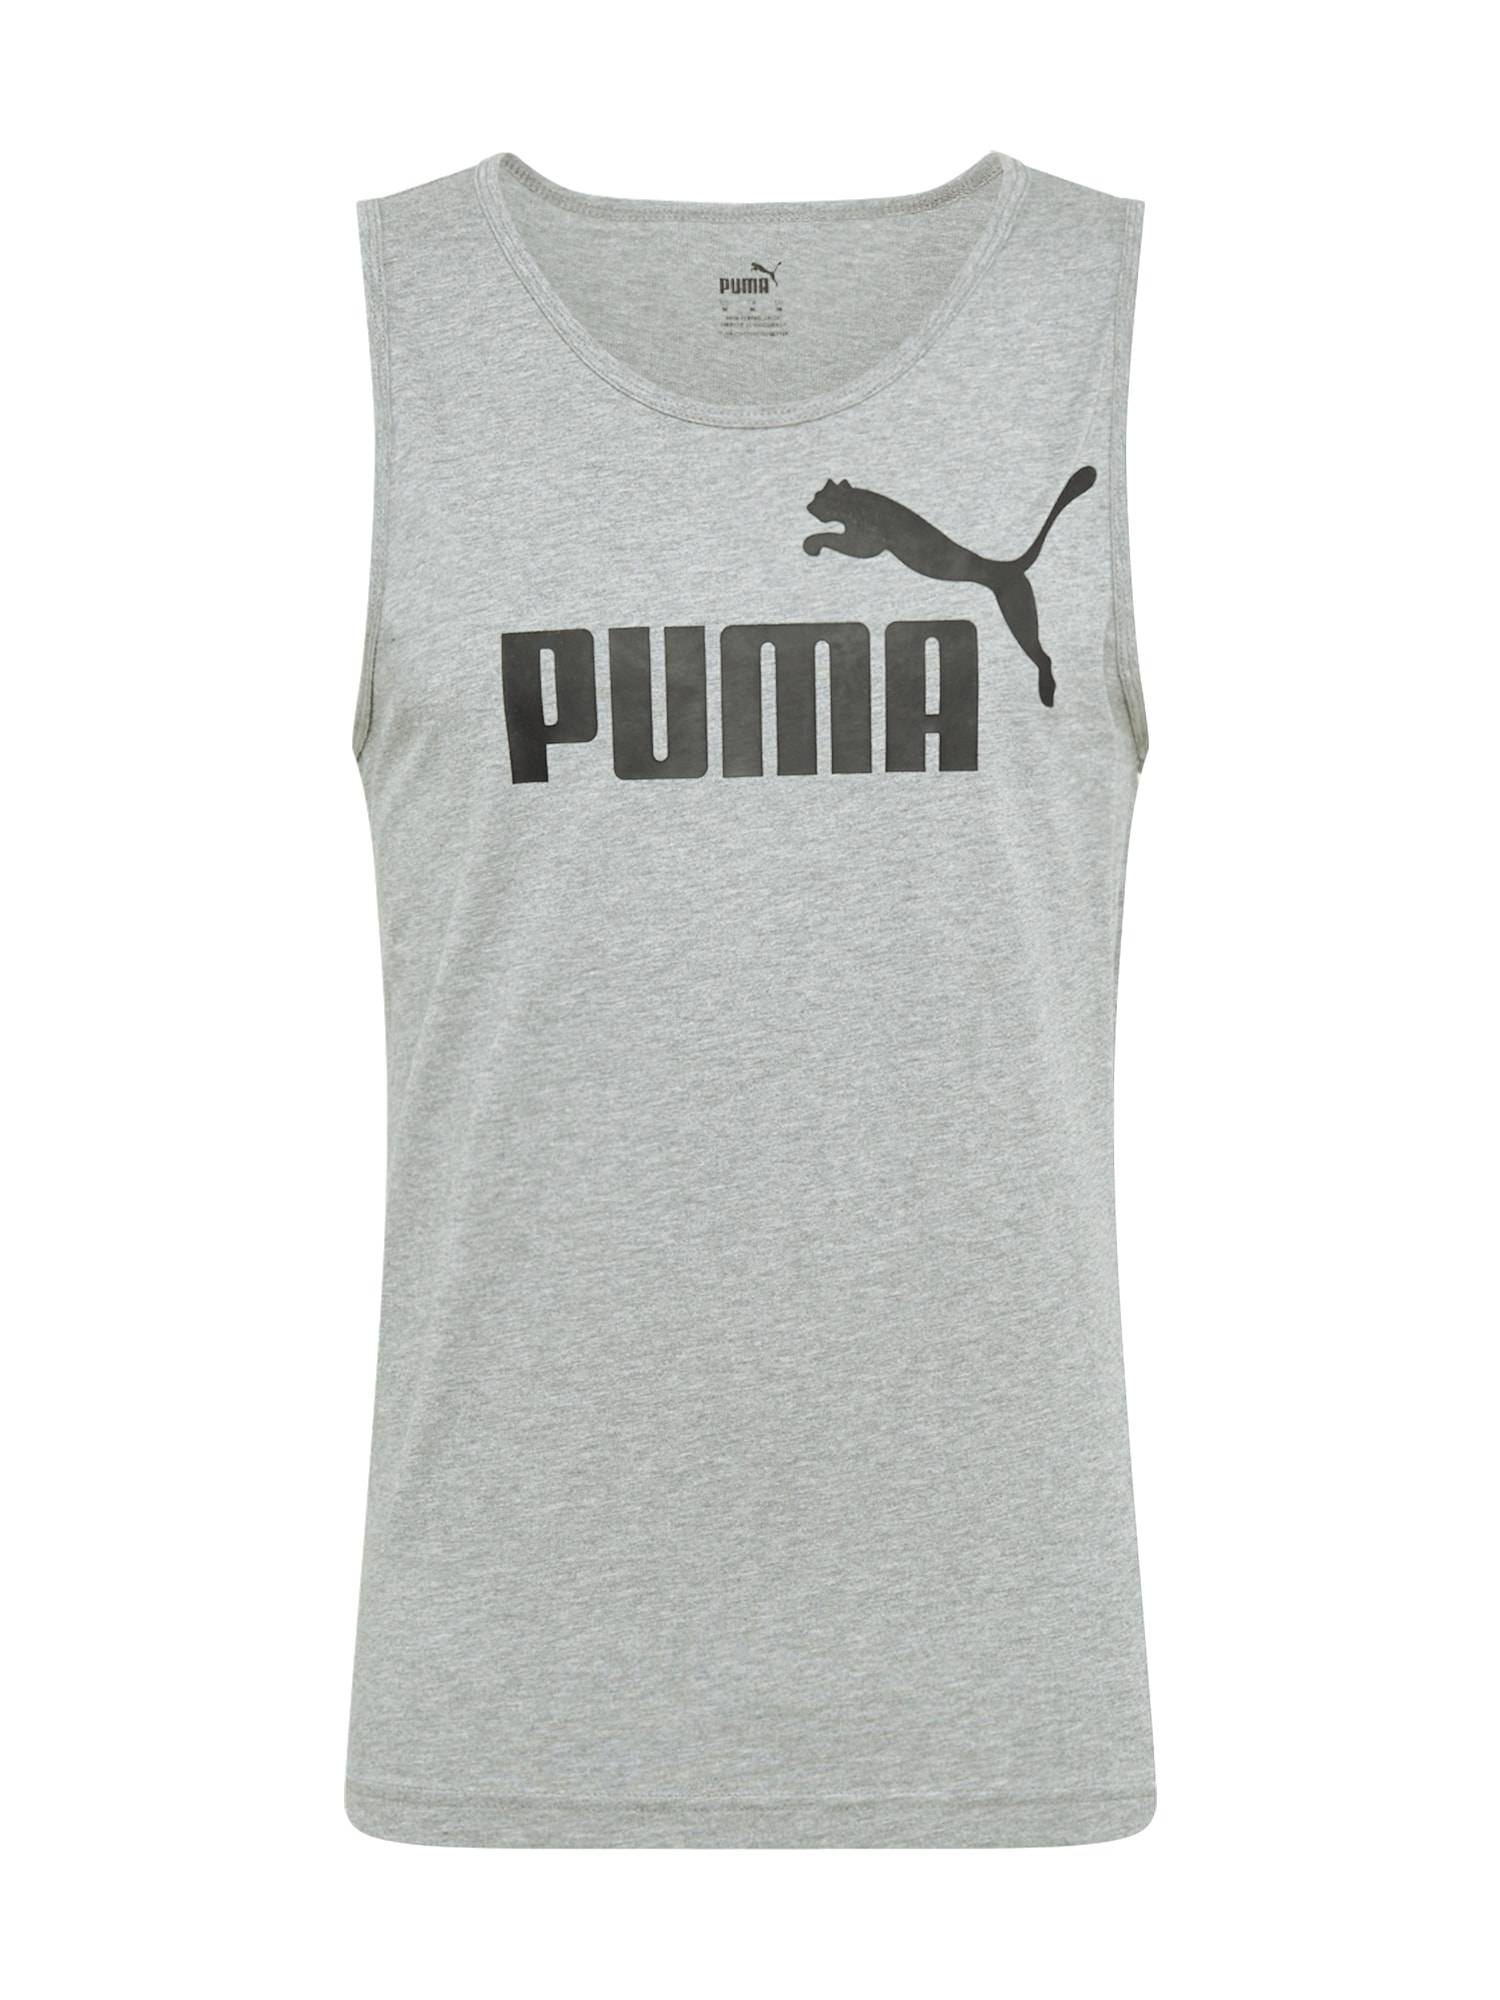 PUMA T-Shirt  - Gris - Taille: XL - male